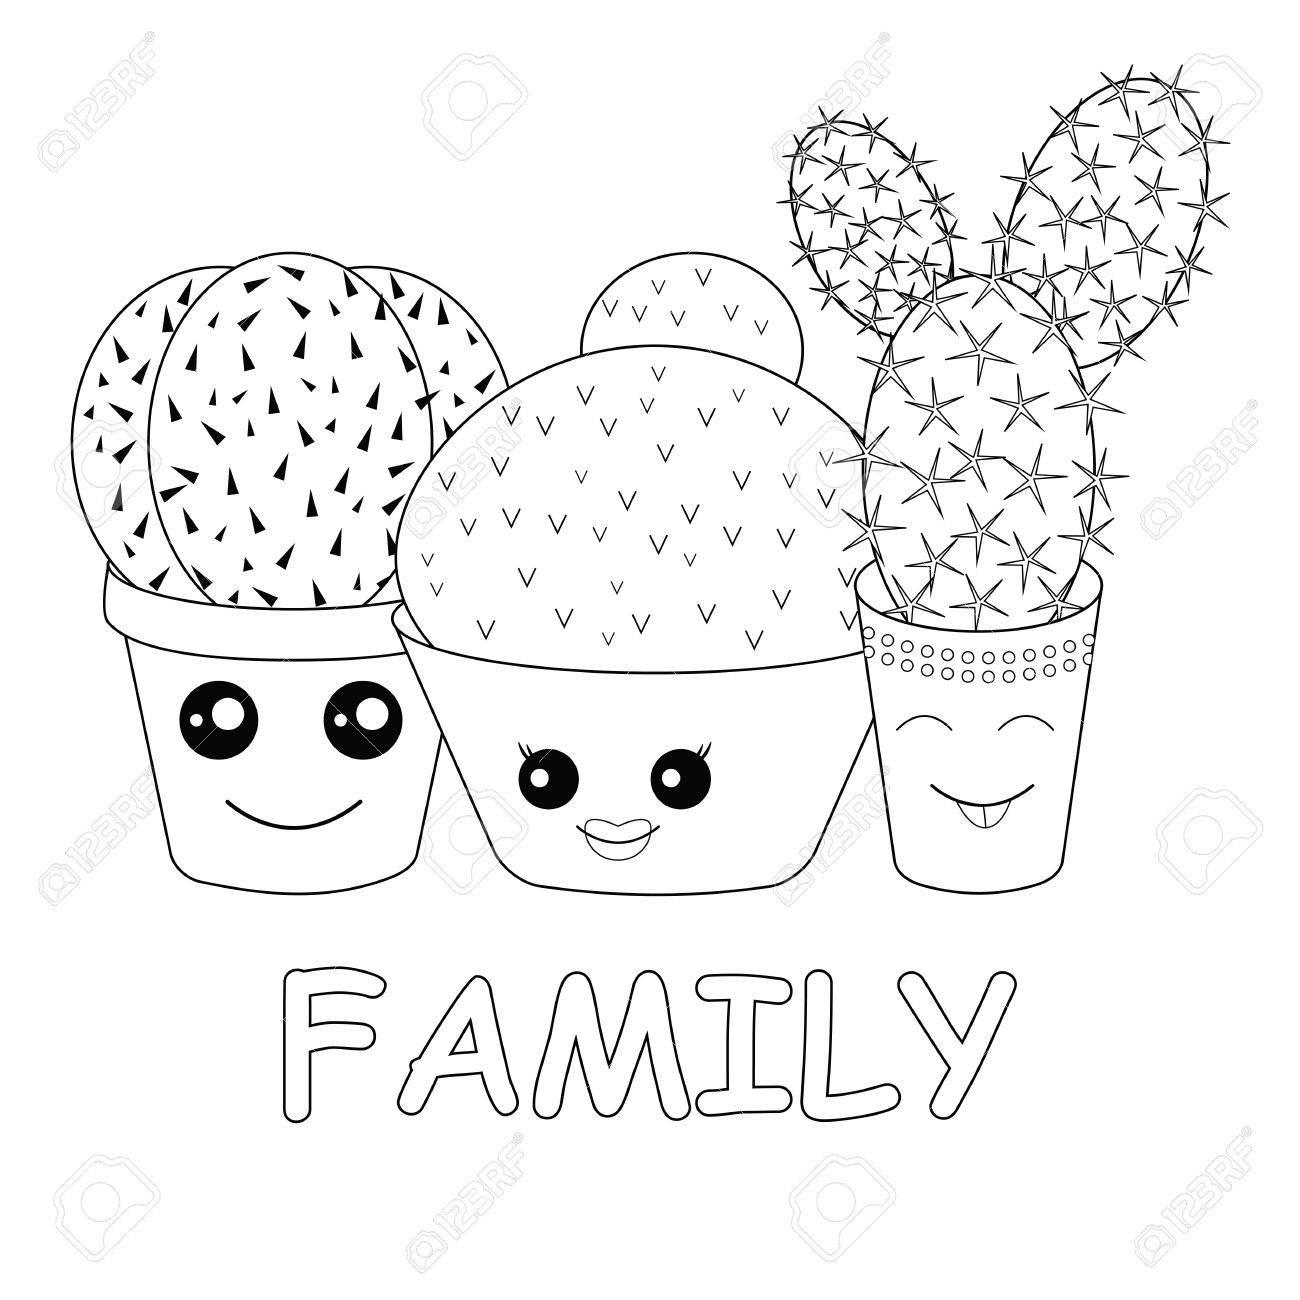 Farbung Mit Cacti Coloring Page Hilarious Familie Von Kakteen Auf